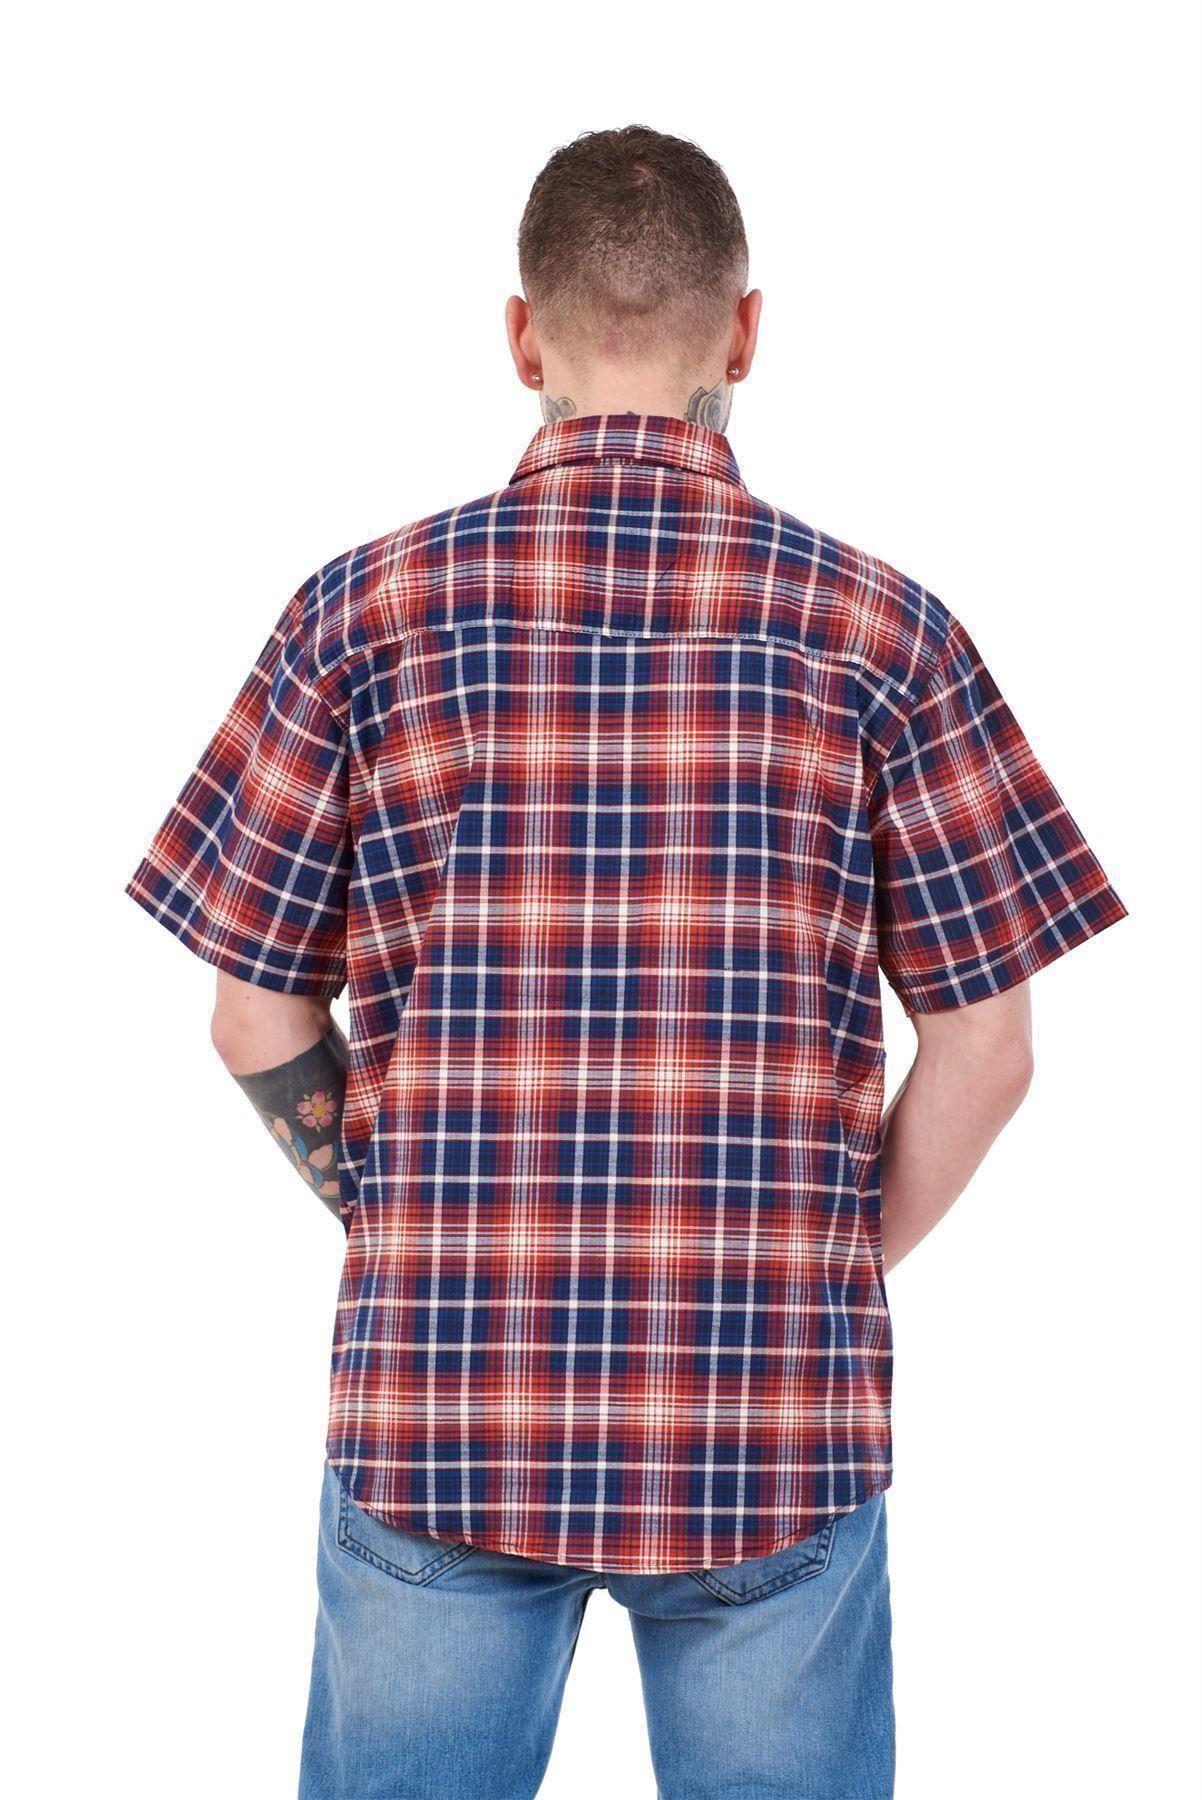 Mens-Regular-Big-Size-Shirts-Checked-Cotton-Blend-Casual-Short-Sleeve-Blue-M-5XL thumbnail 29